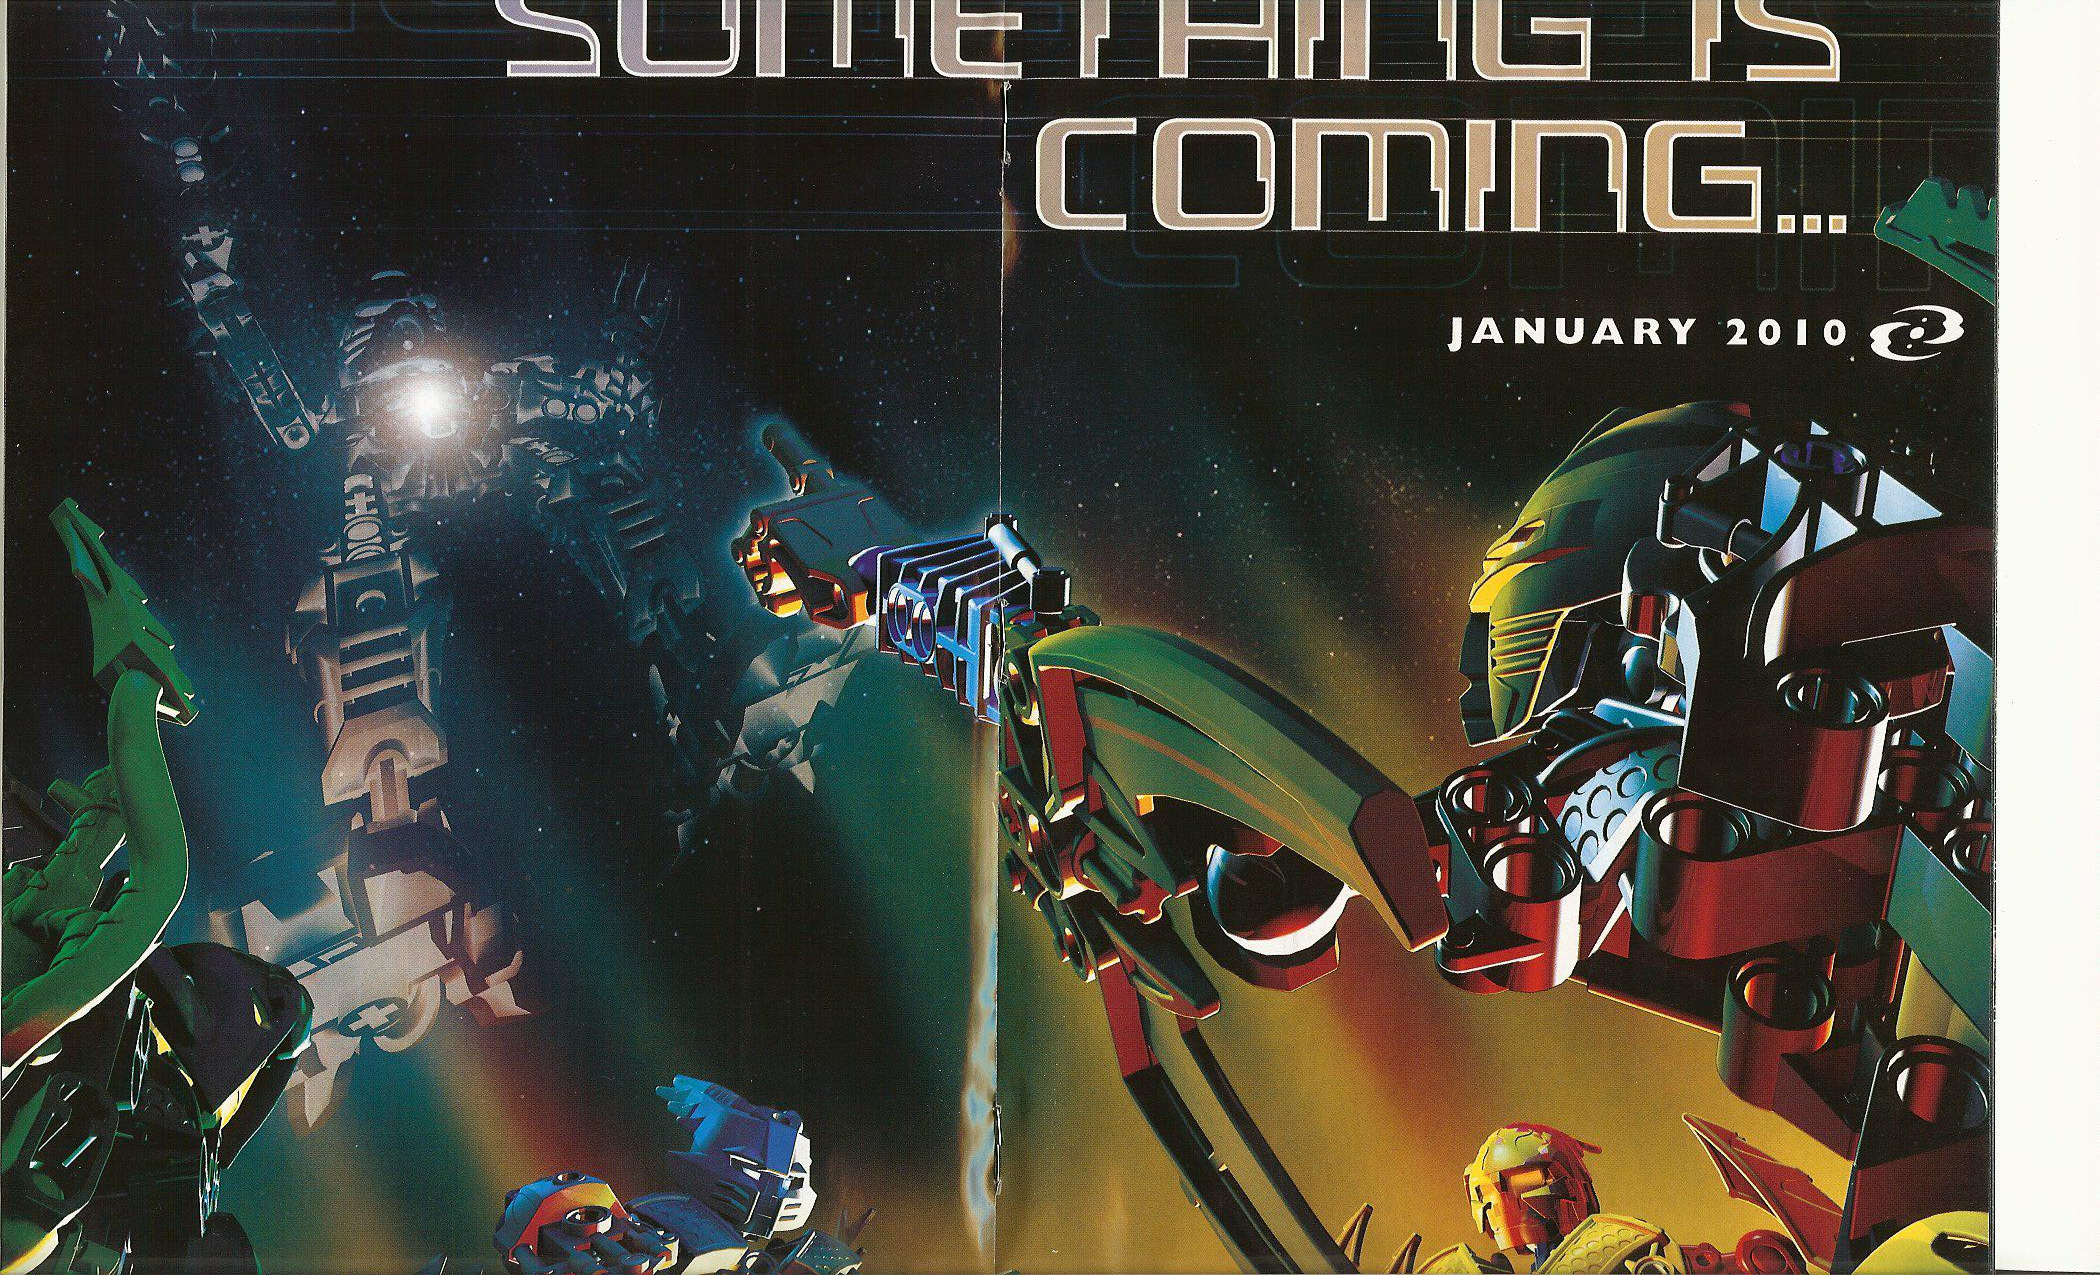 [Bionicle] Premier teaser 2010 dans le LEGO Magazine Tahunui